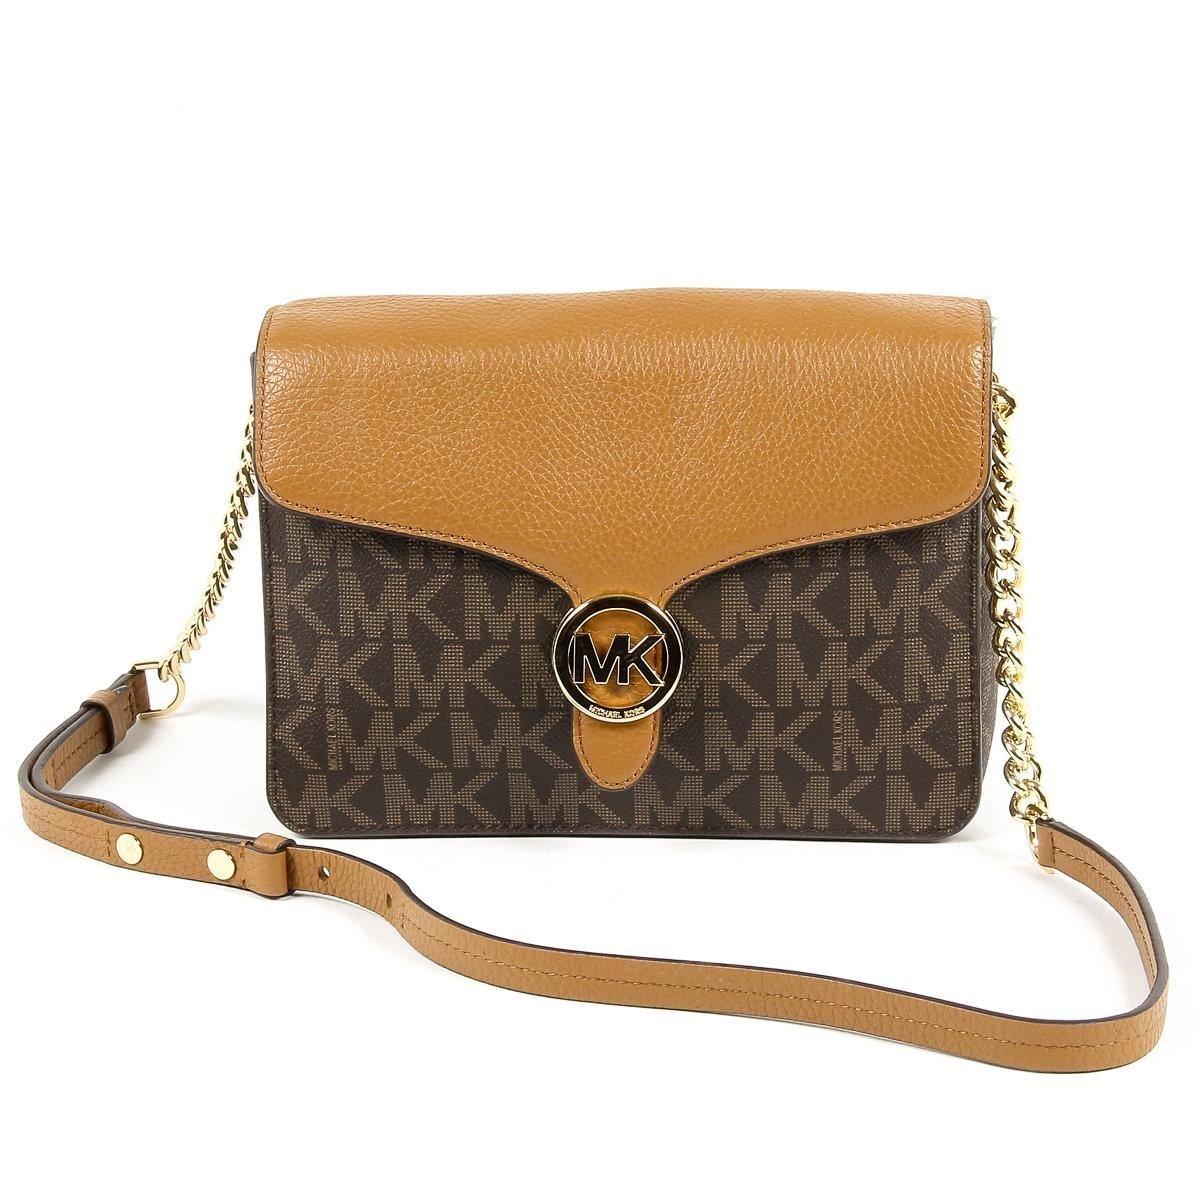 Michael kors Women's Venna Medium Shoulder Flap Leather Bag, Style 35T7GV3F2B, Brown Acorn